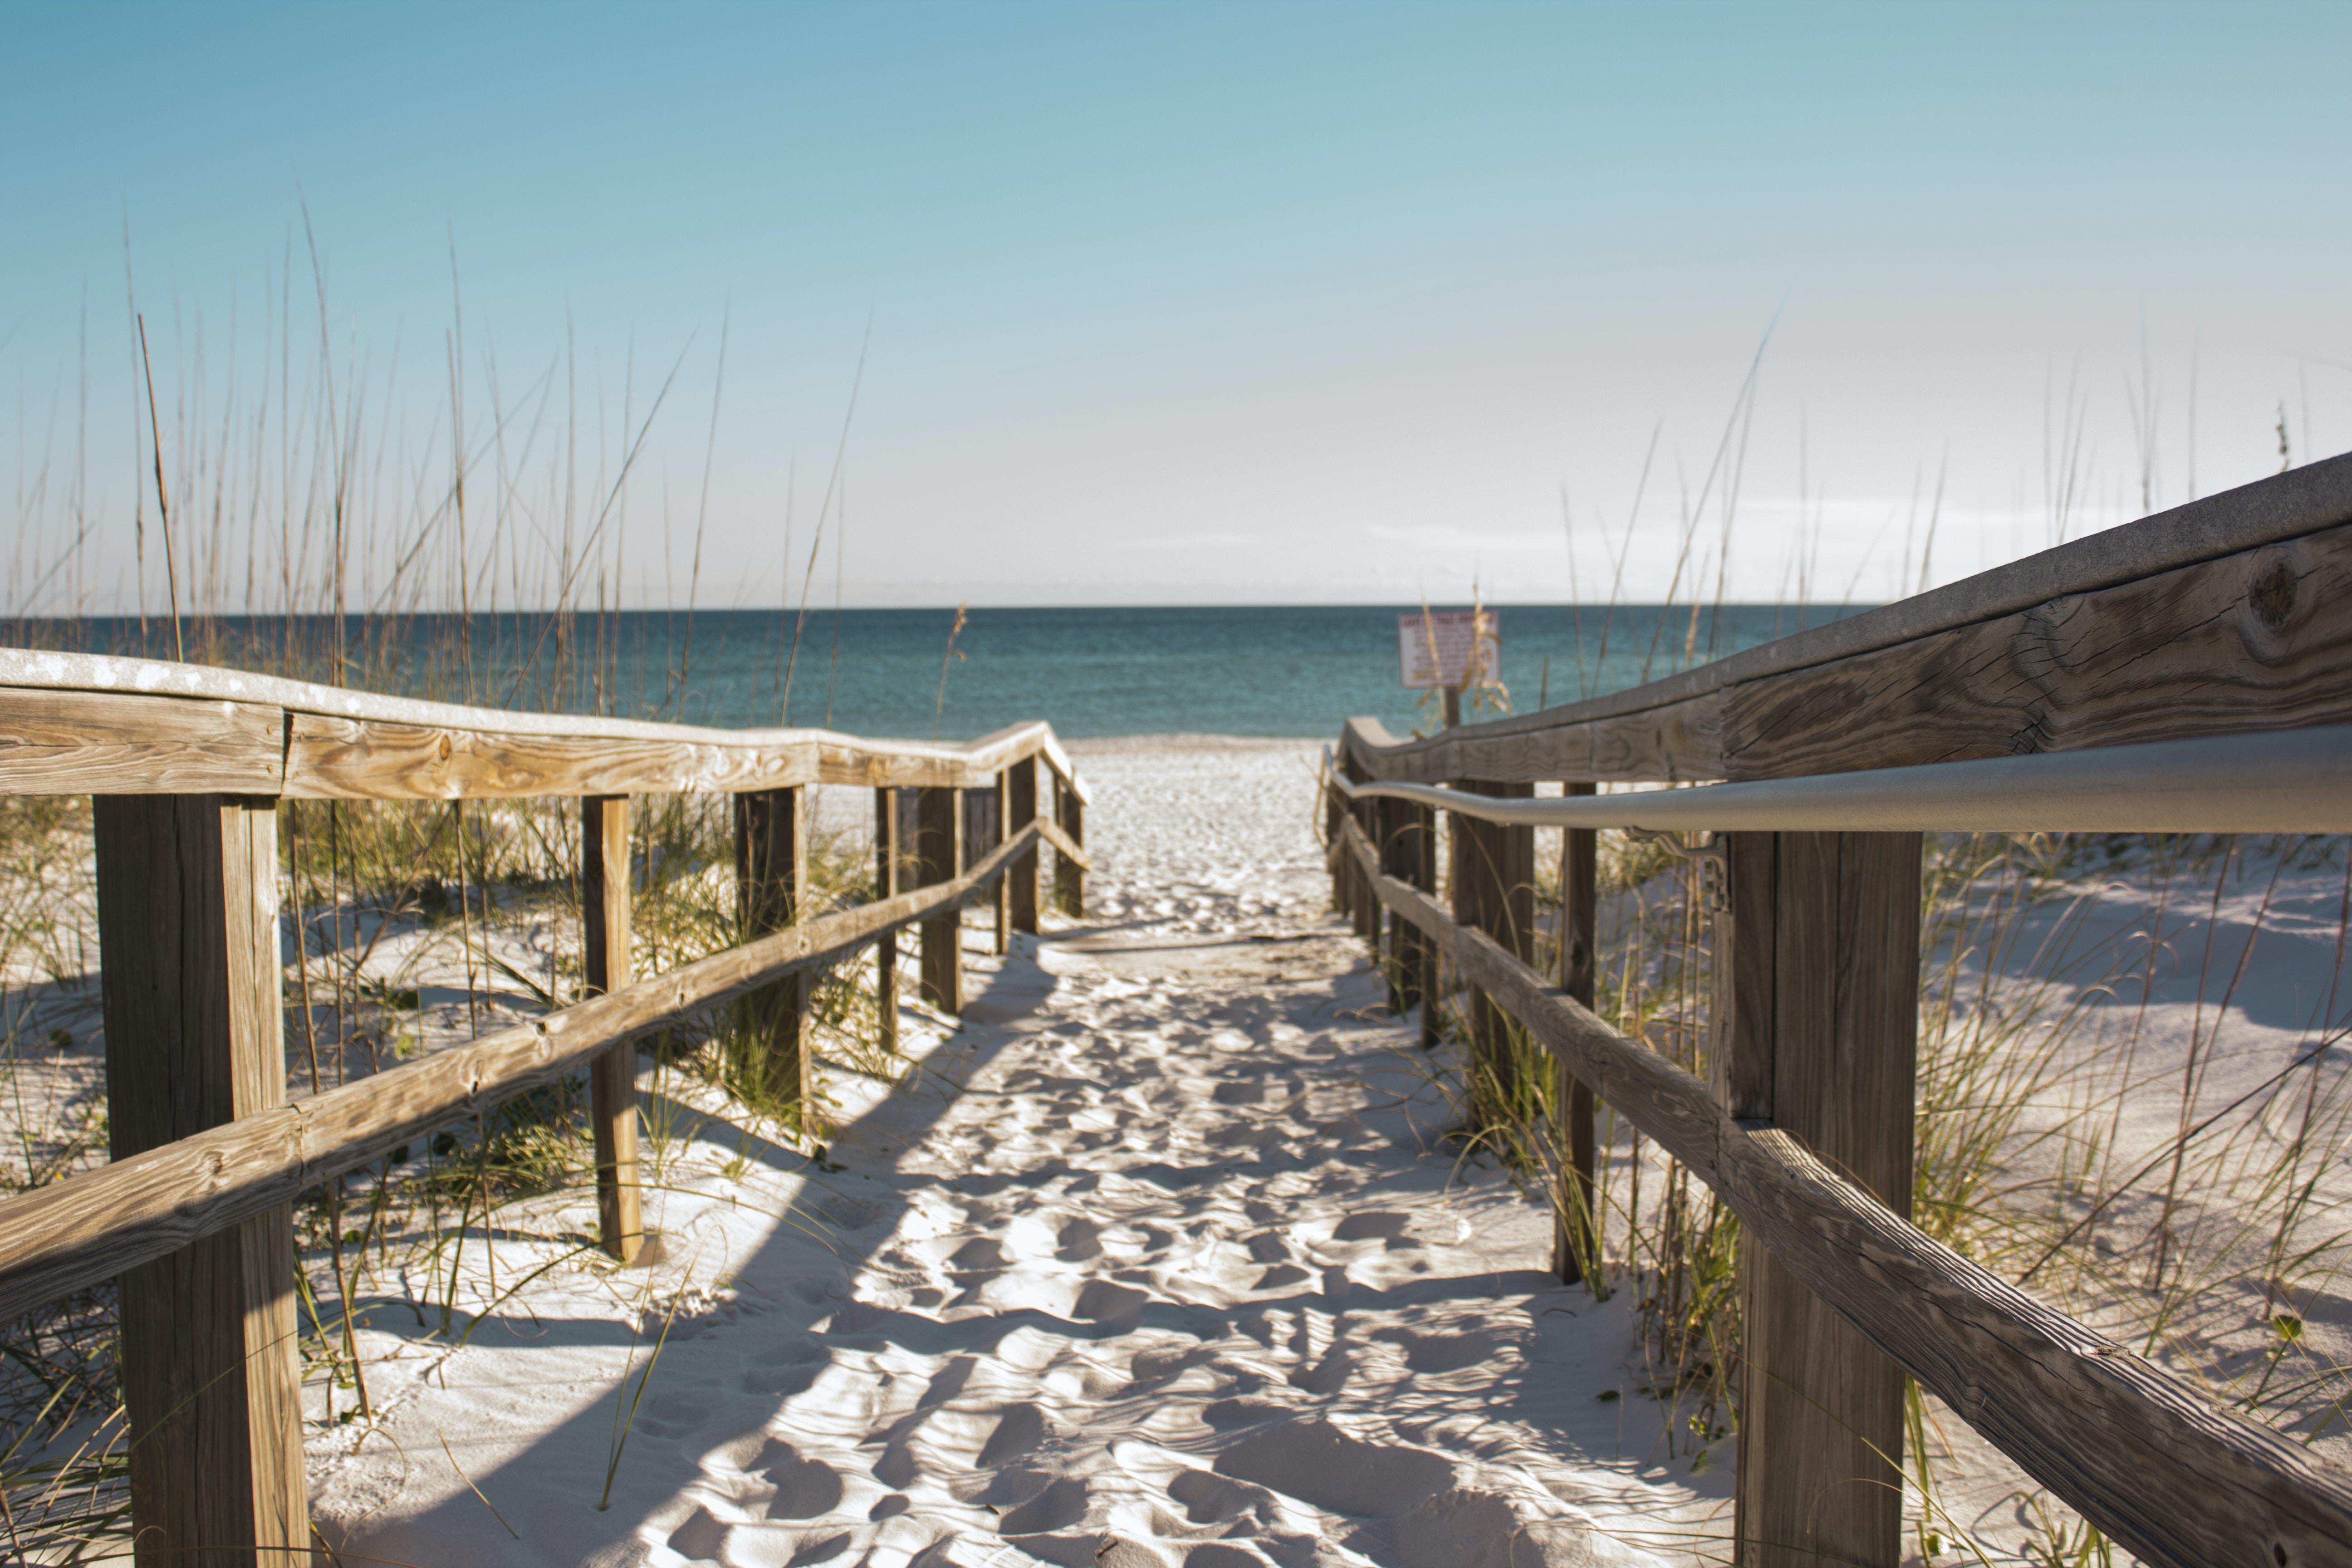 wooden fence towards the ocean